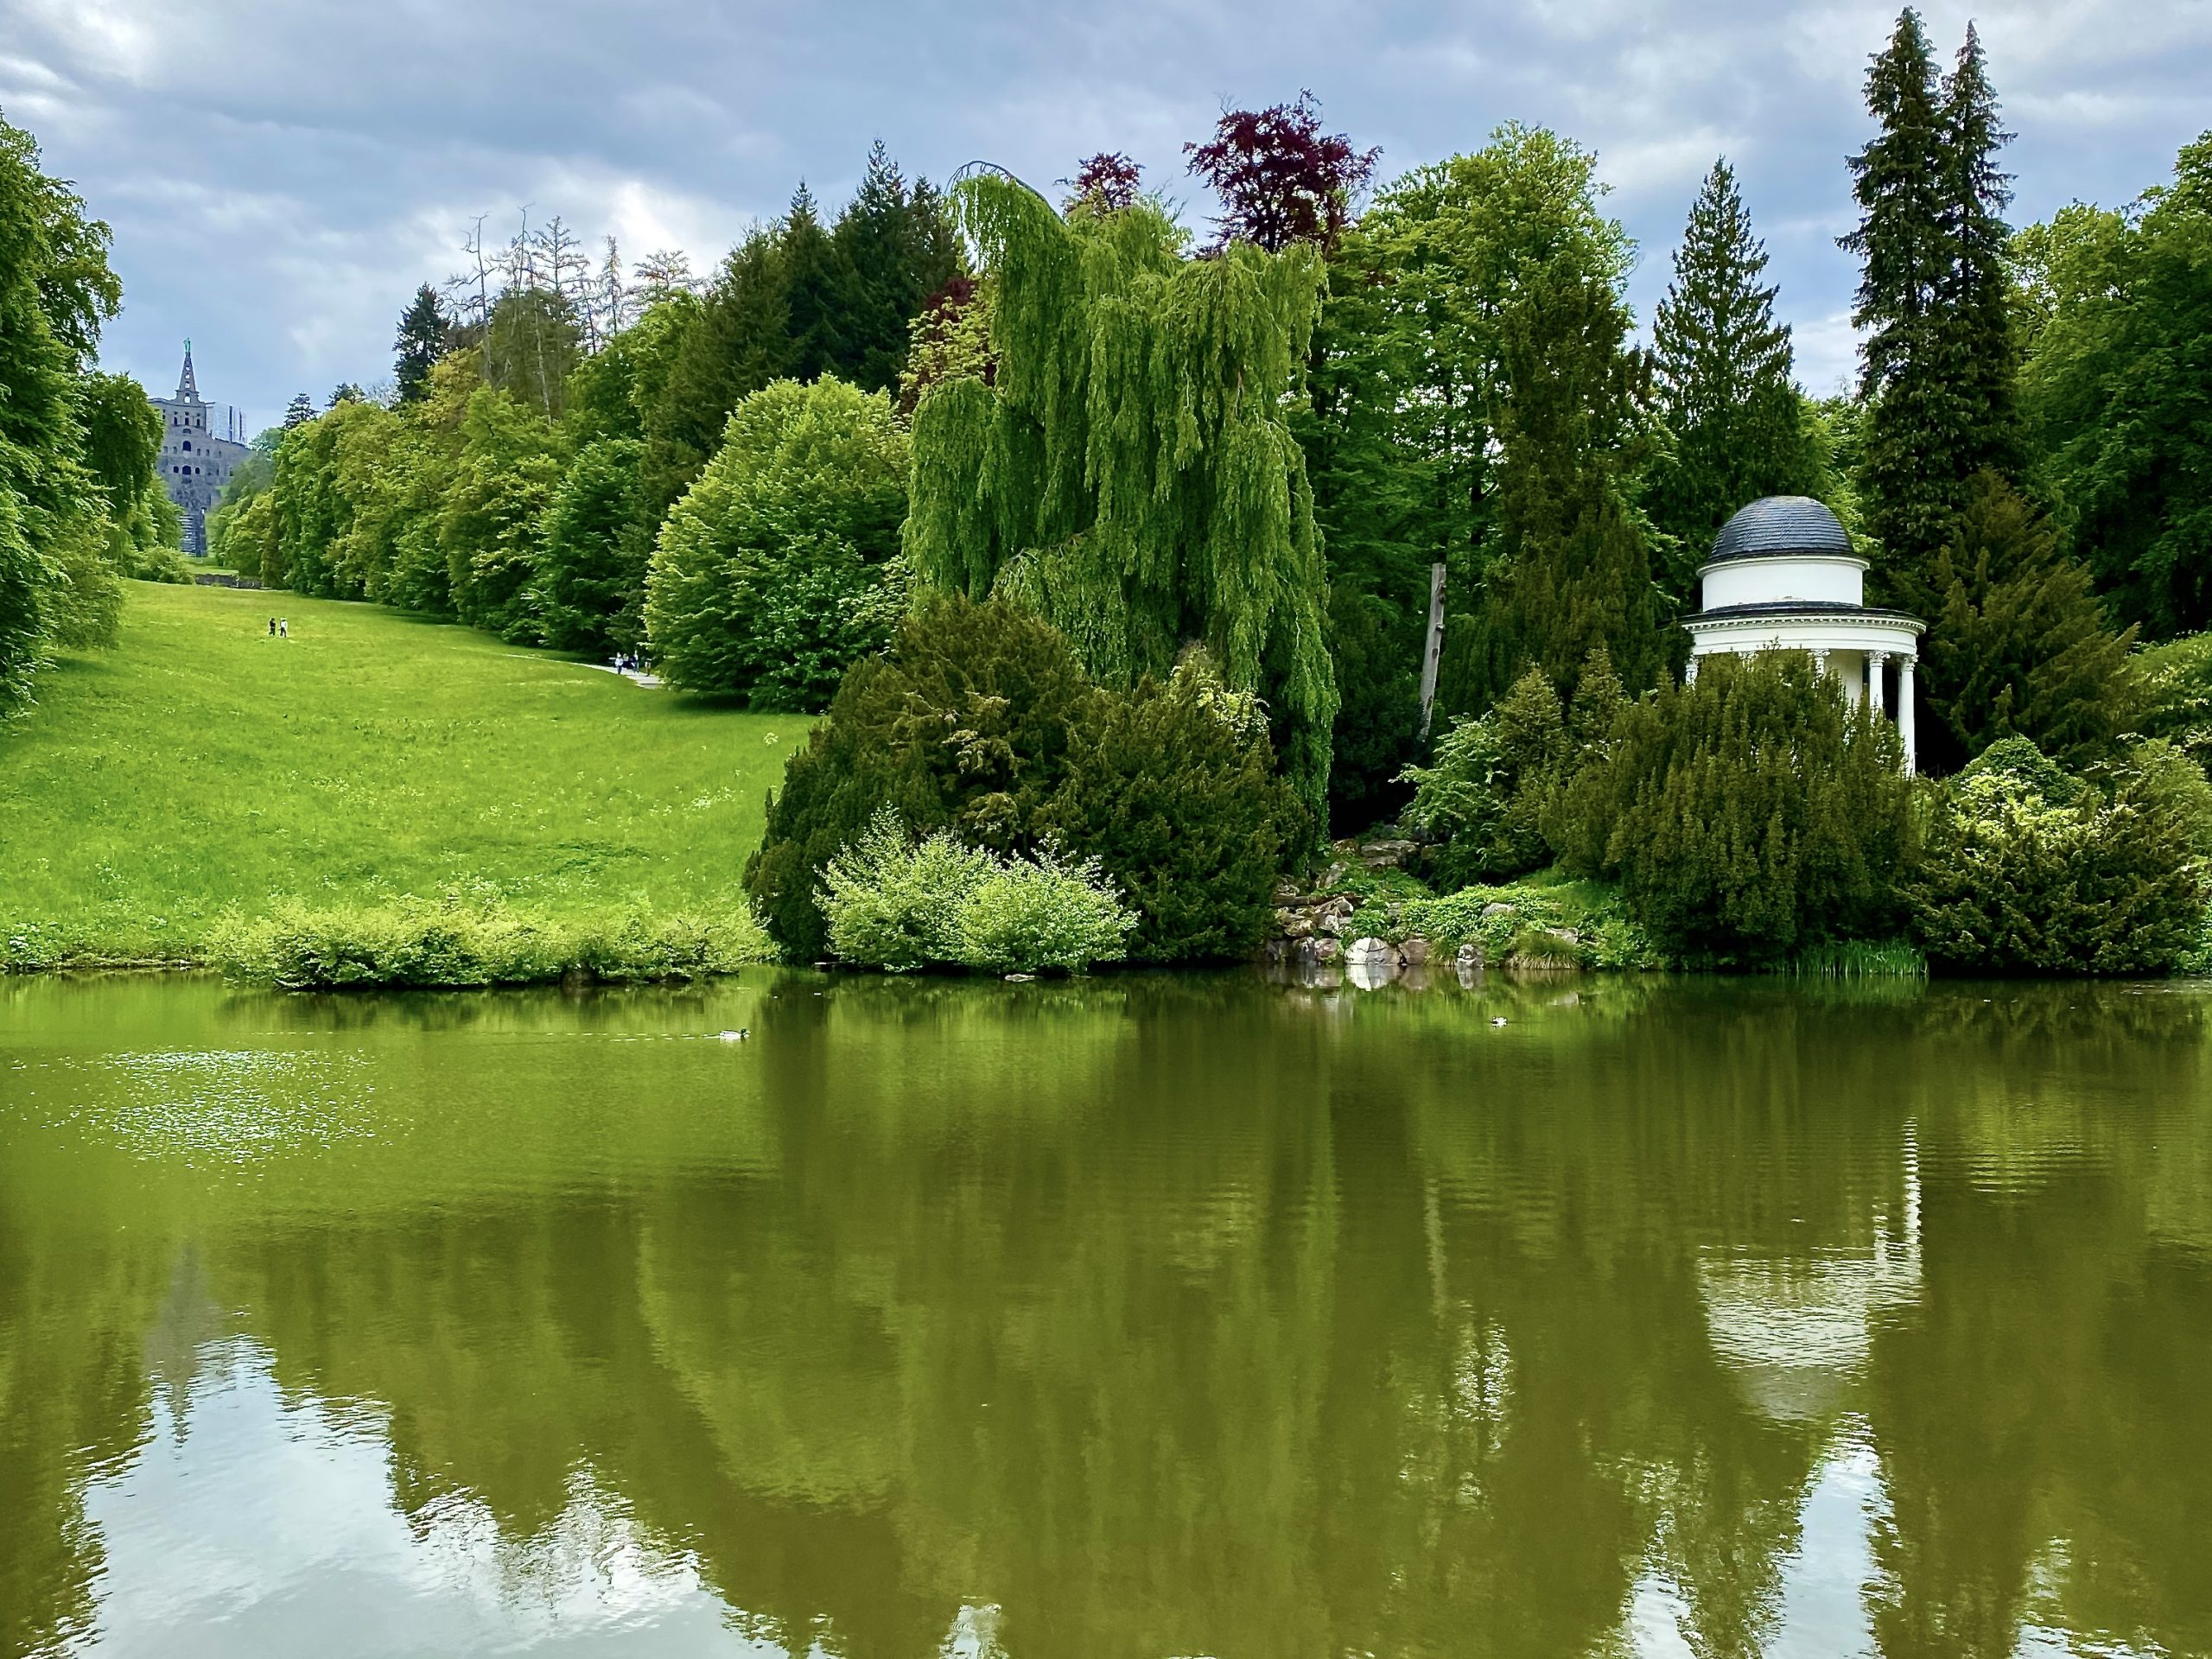 Bergpark Wilhelmshöhe Apollotempel am Fontänenteich Herkules-Denkmal UNESCO-Weltkulturerbe Kassel Hessen